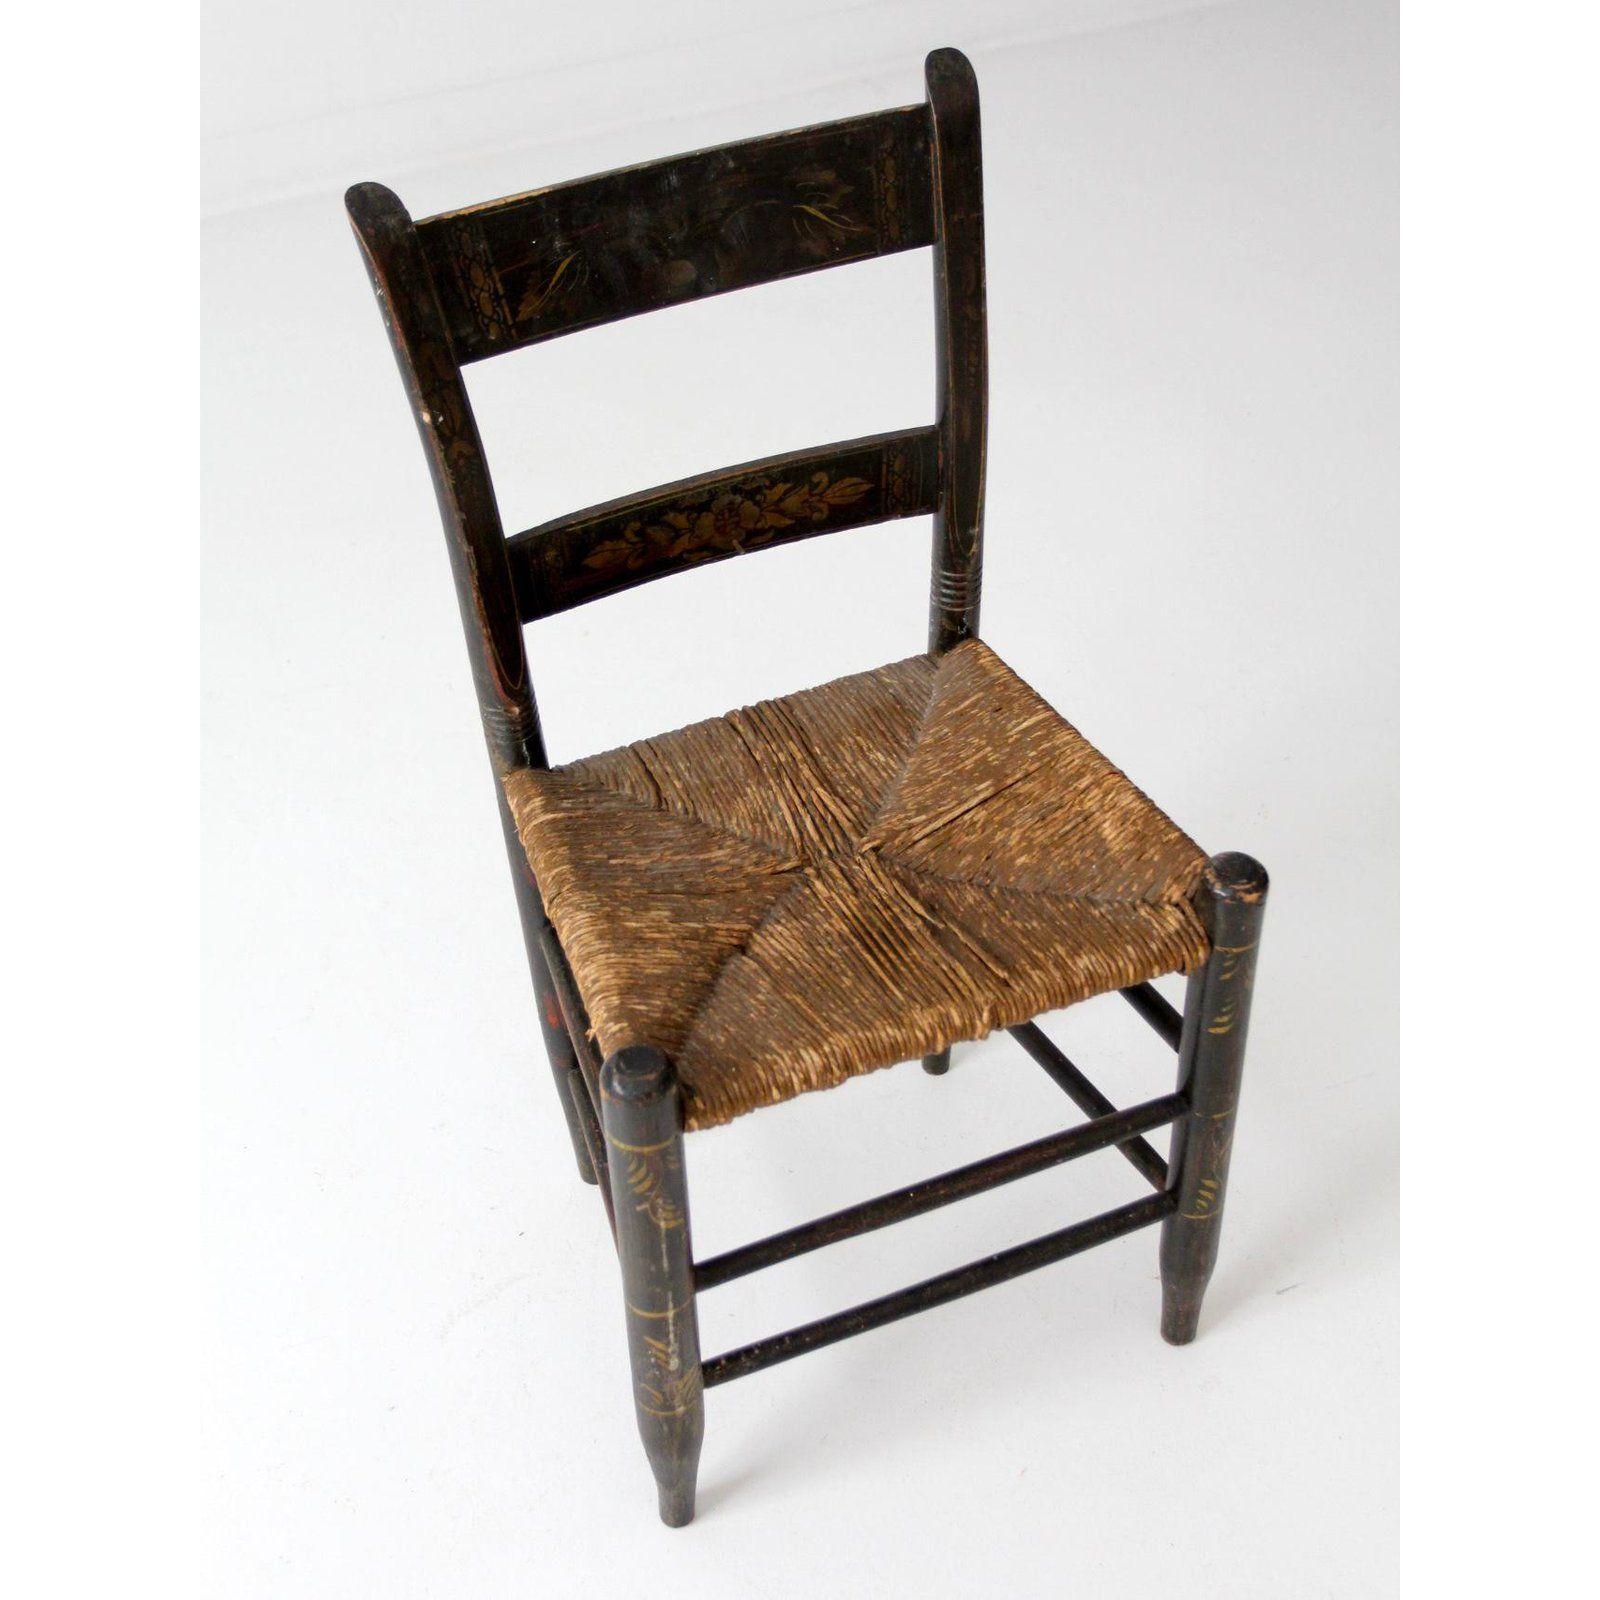 Ethan Allen Nutmeg Black Hitchcock High Back Duxbury Accent Chair 14 6072 Accent Chairs Chair Vintage Furniture